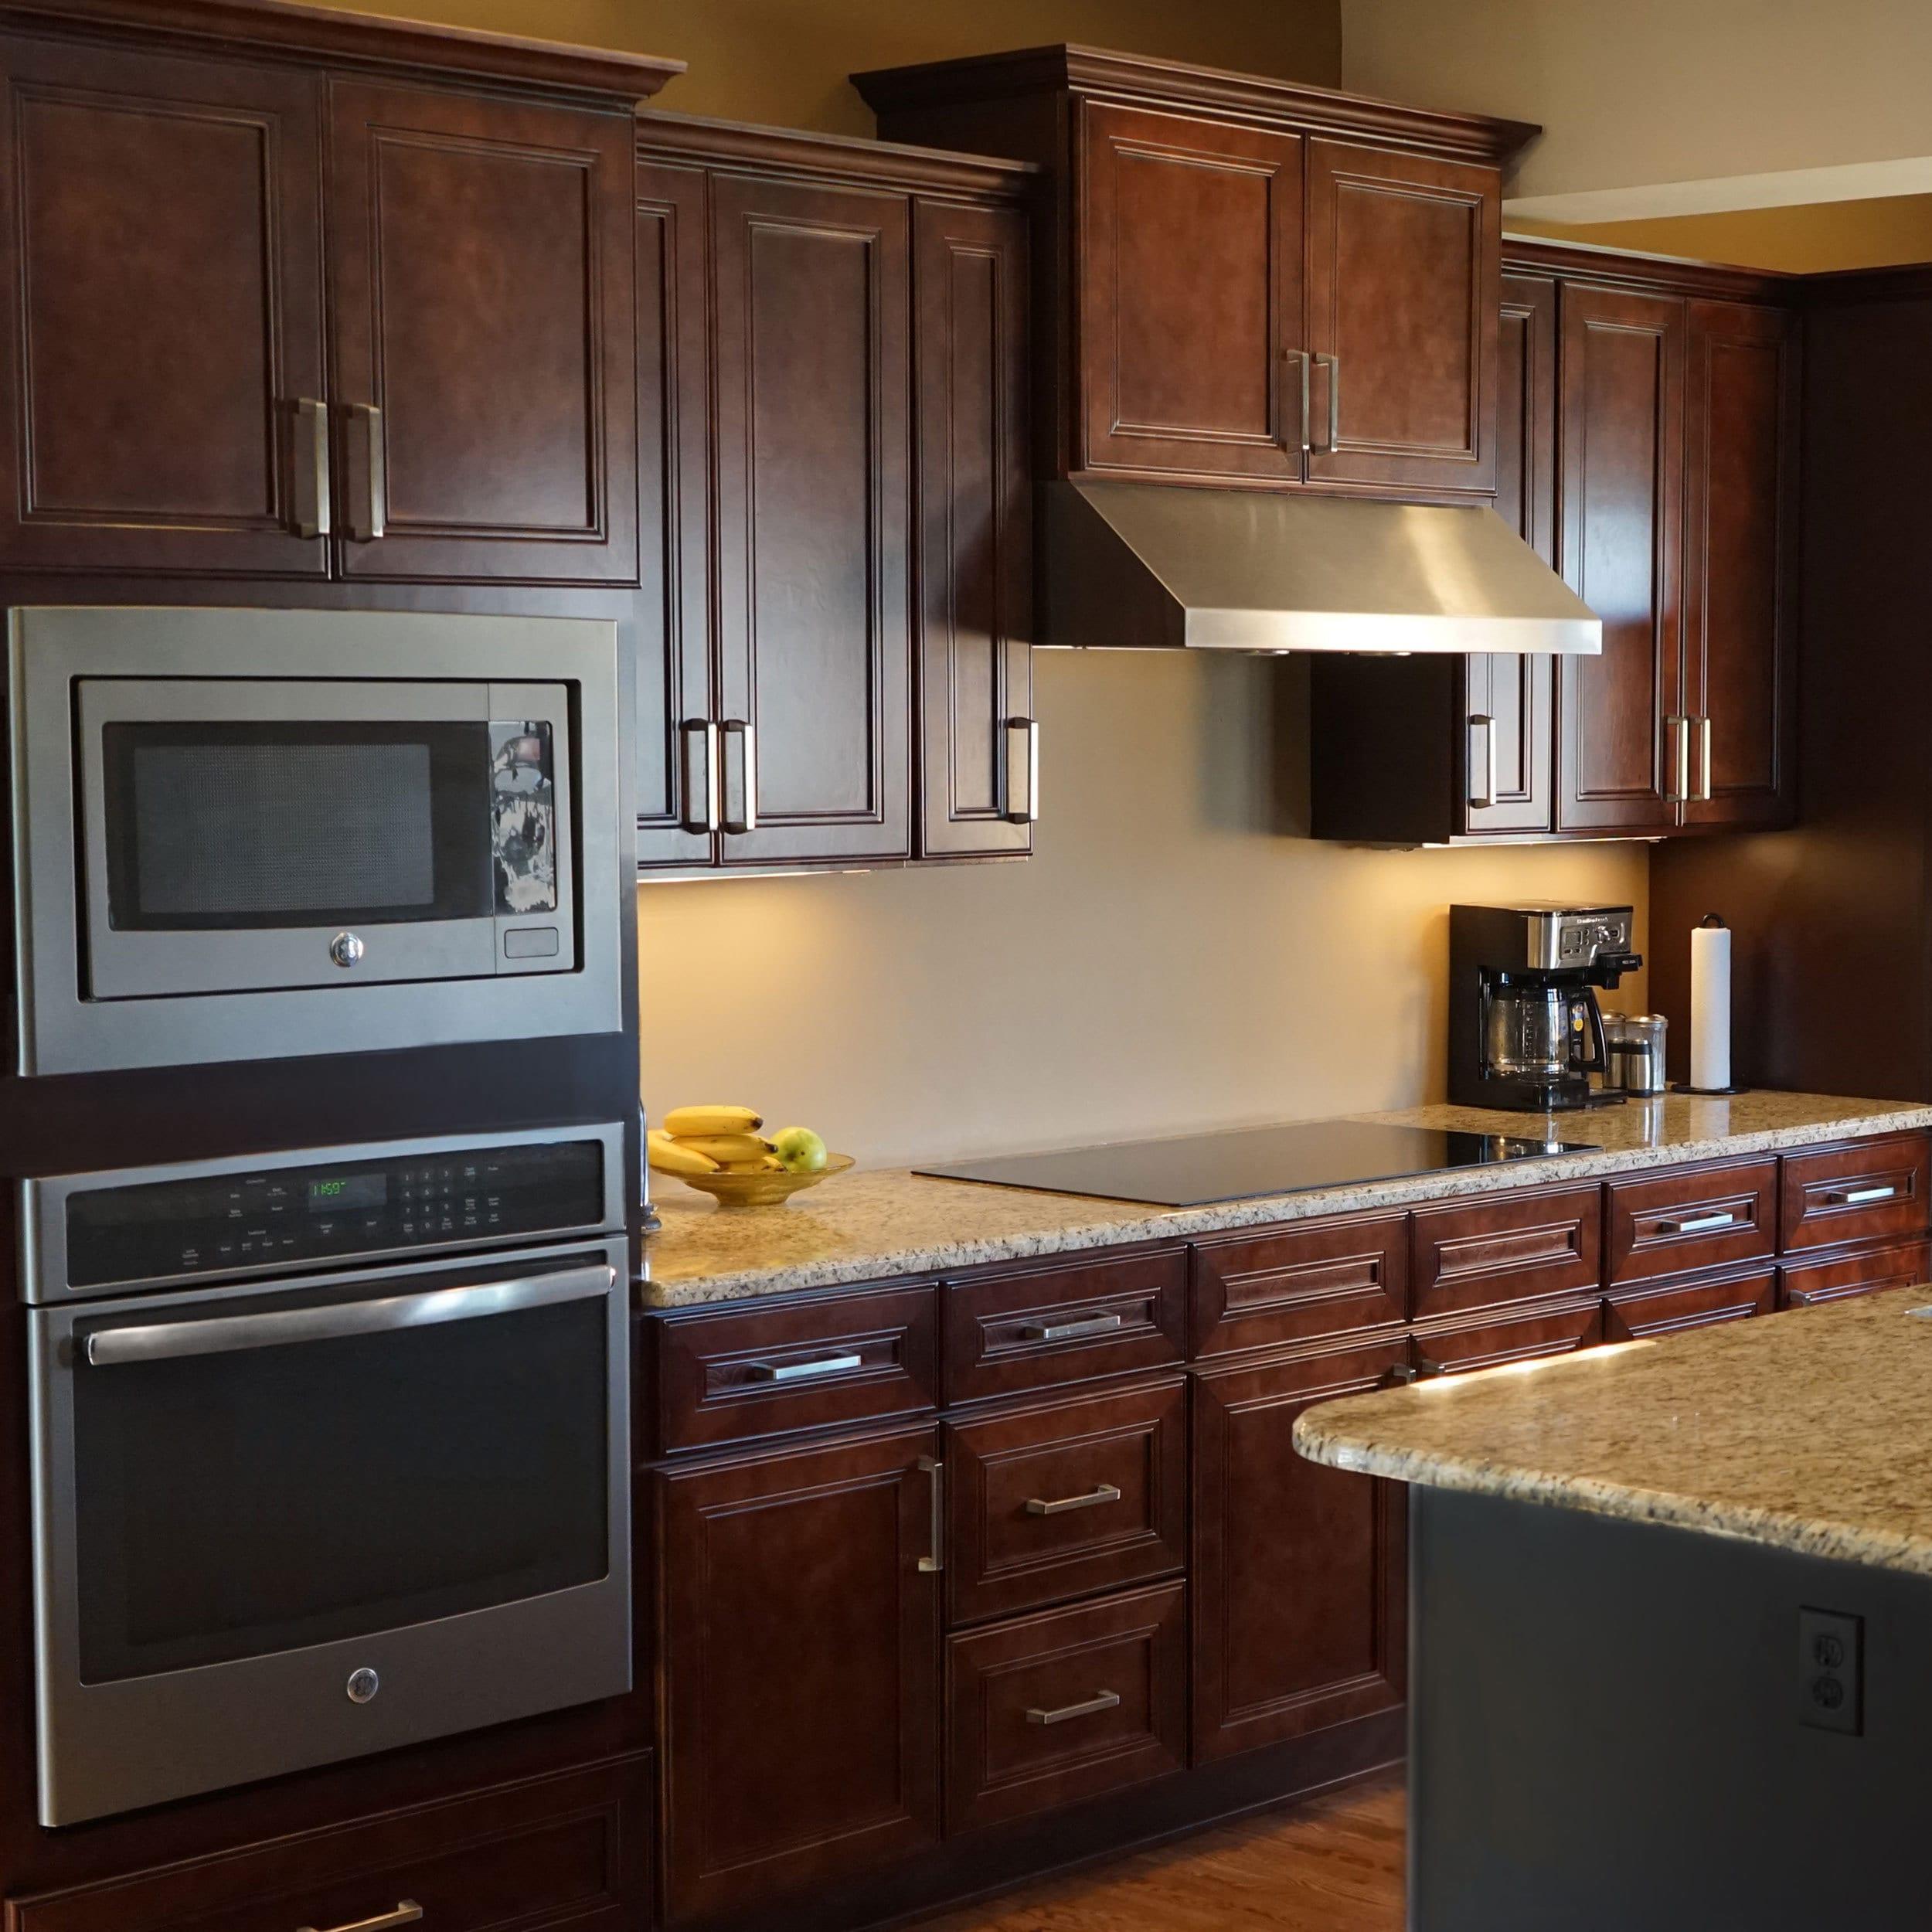 Shop Everyday Cabinets 42 Inch Cherry Mahogany Brown Leo Saddle Blind Corner Base Kitchen Cabinet Left Overstock 12315105